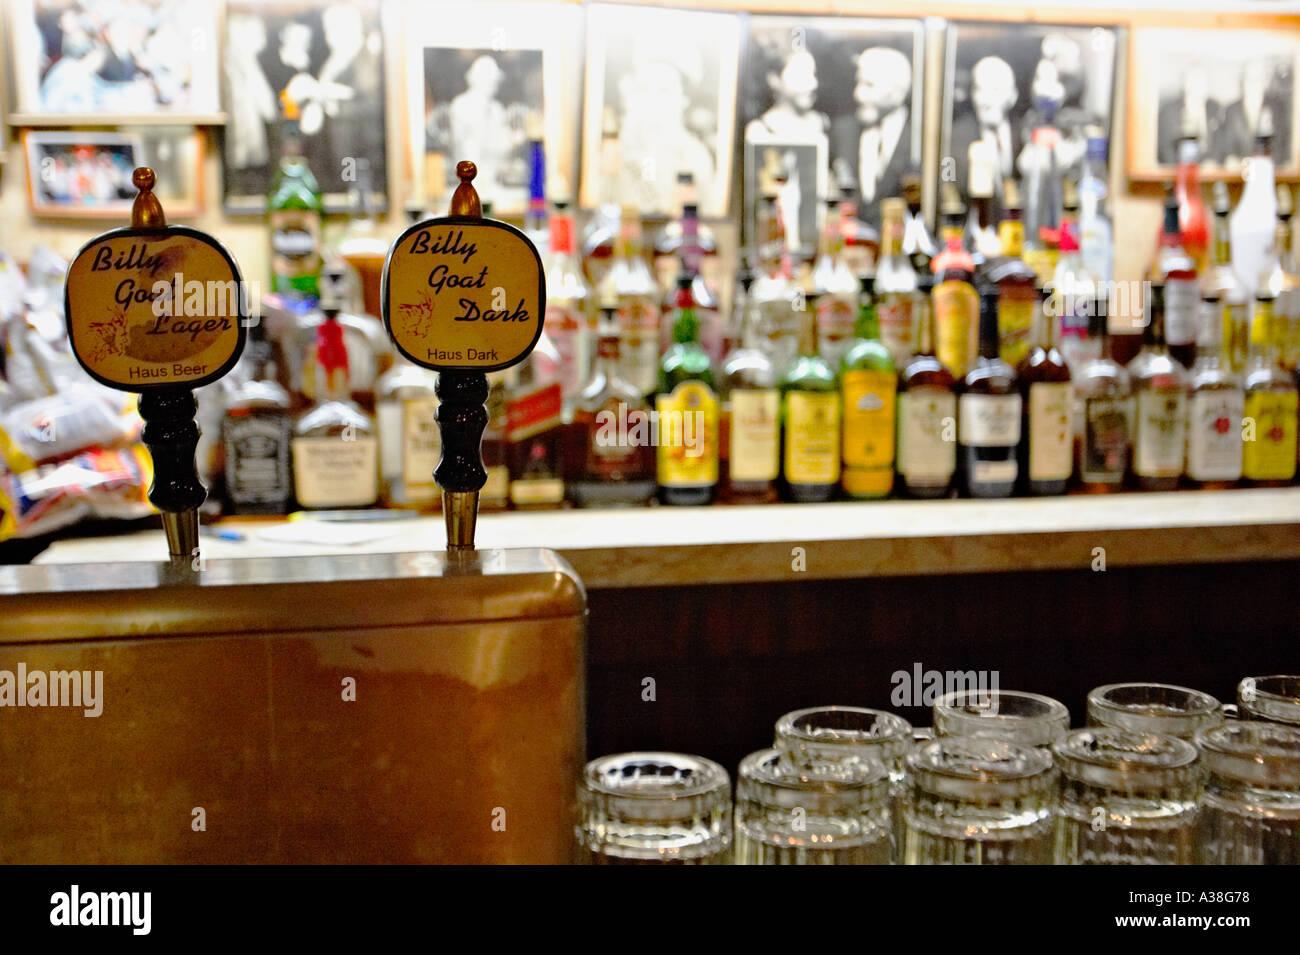 Bar Beer Pulls Stock Photos & Bar Beer Pulls Stock Images - Alamy